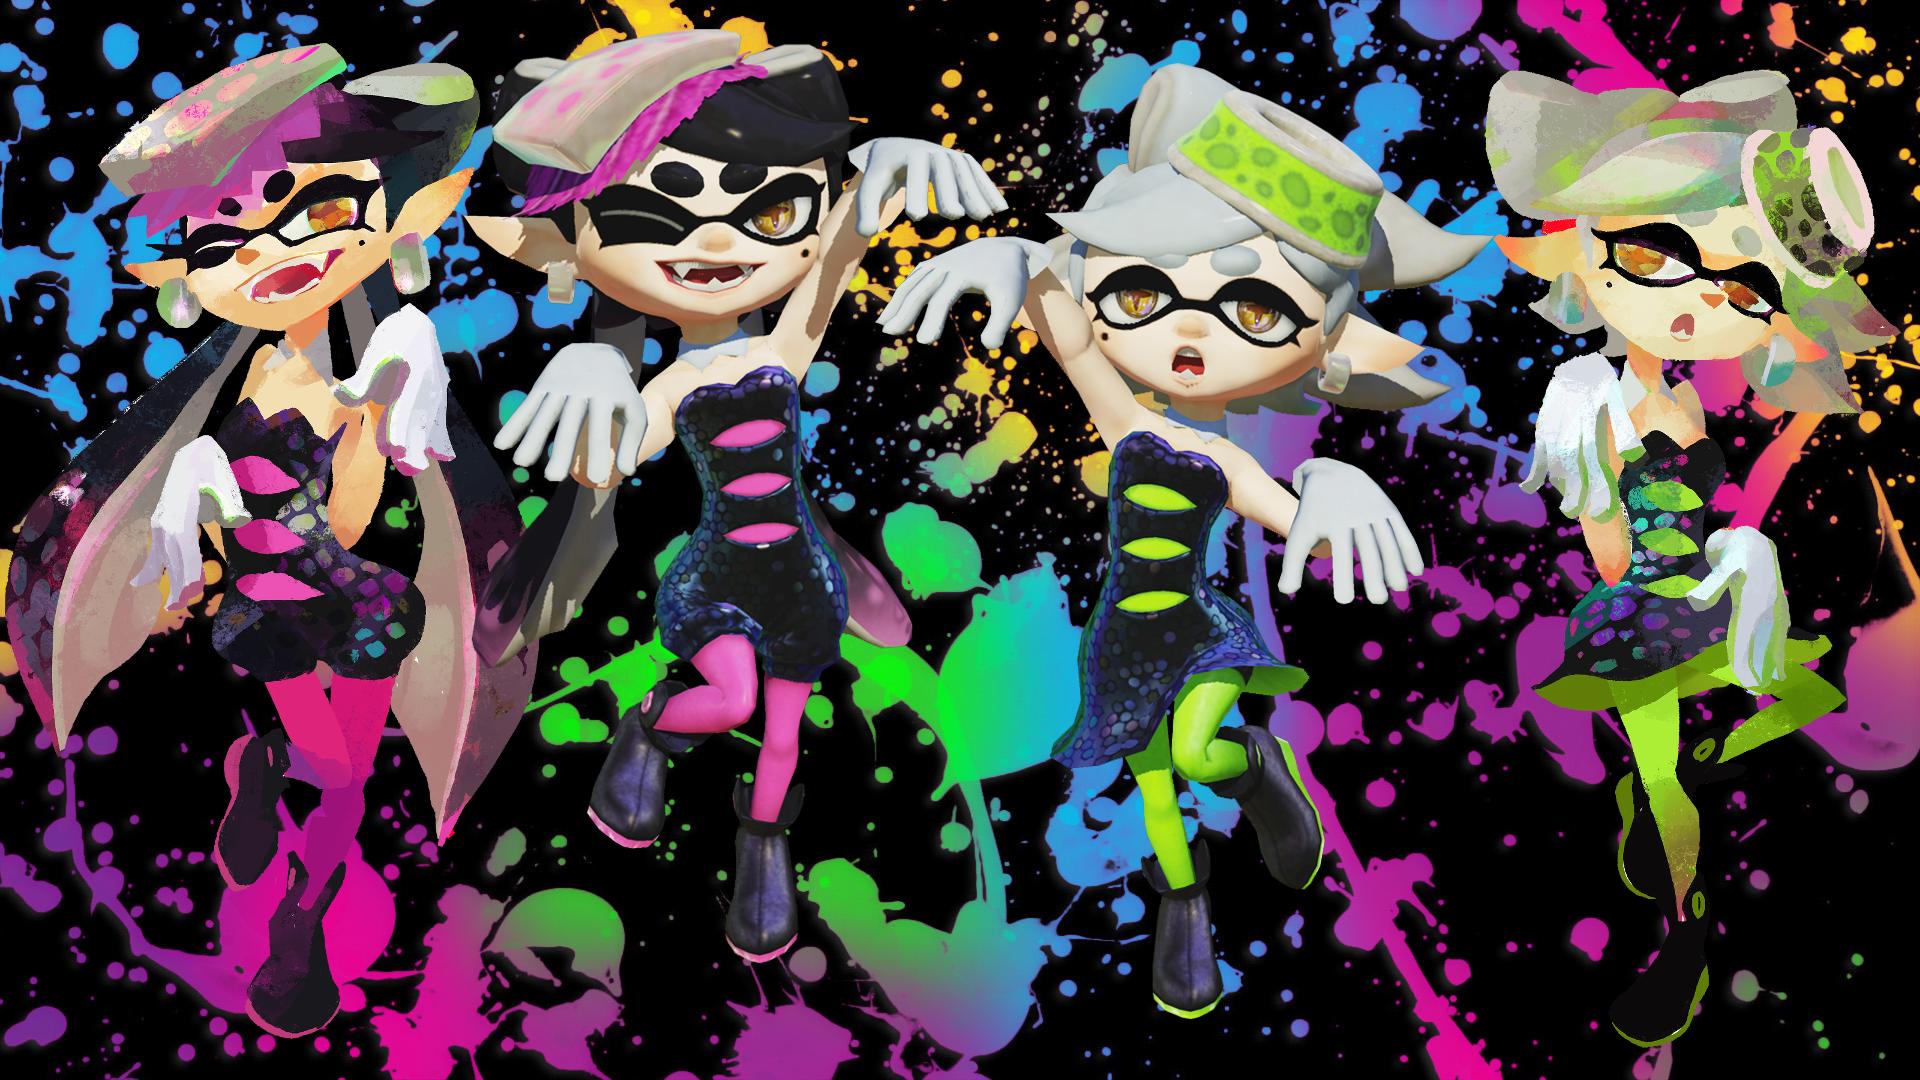 Splatoon Squid Sisters Wallpaper Posted By John Simpson